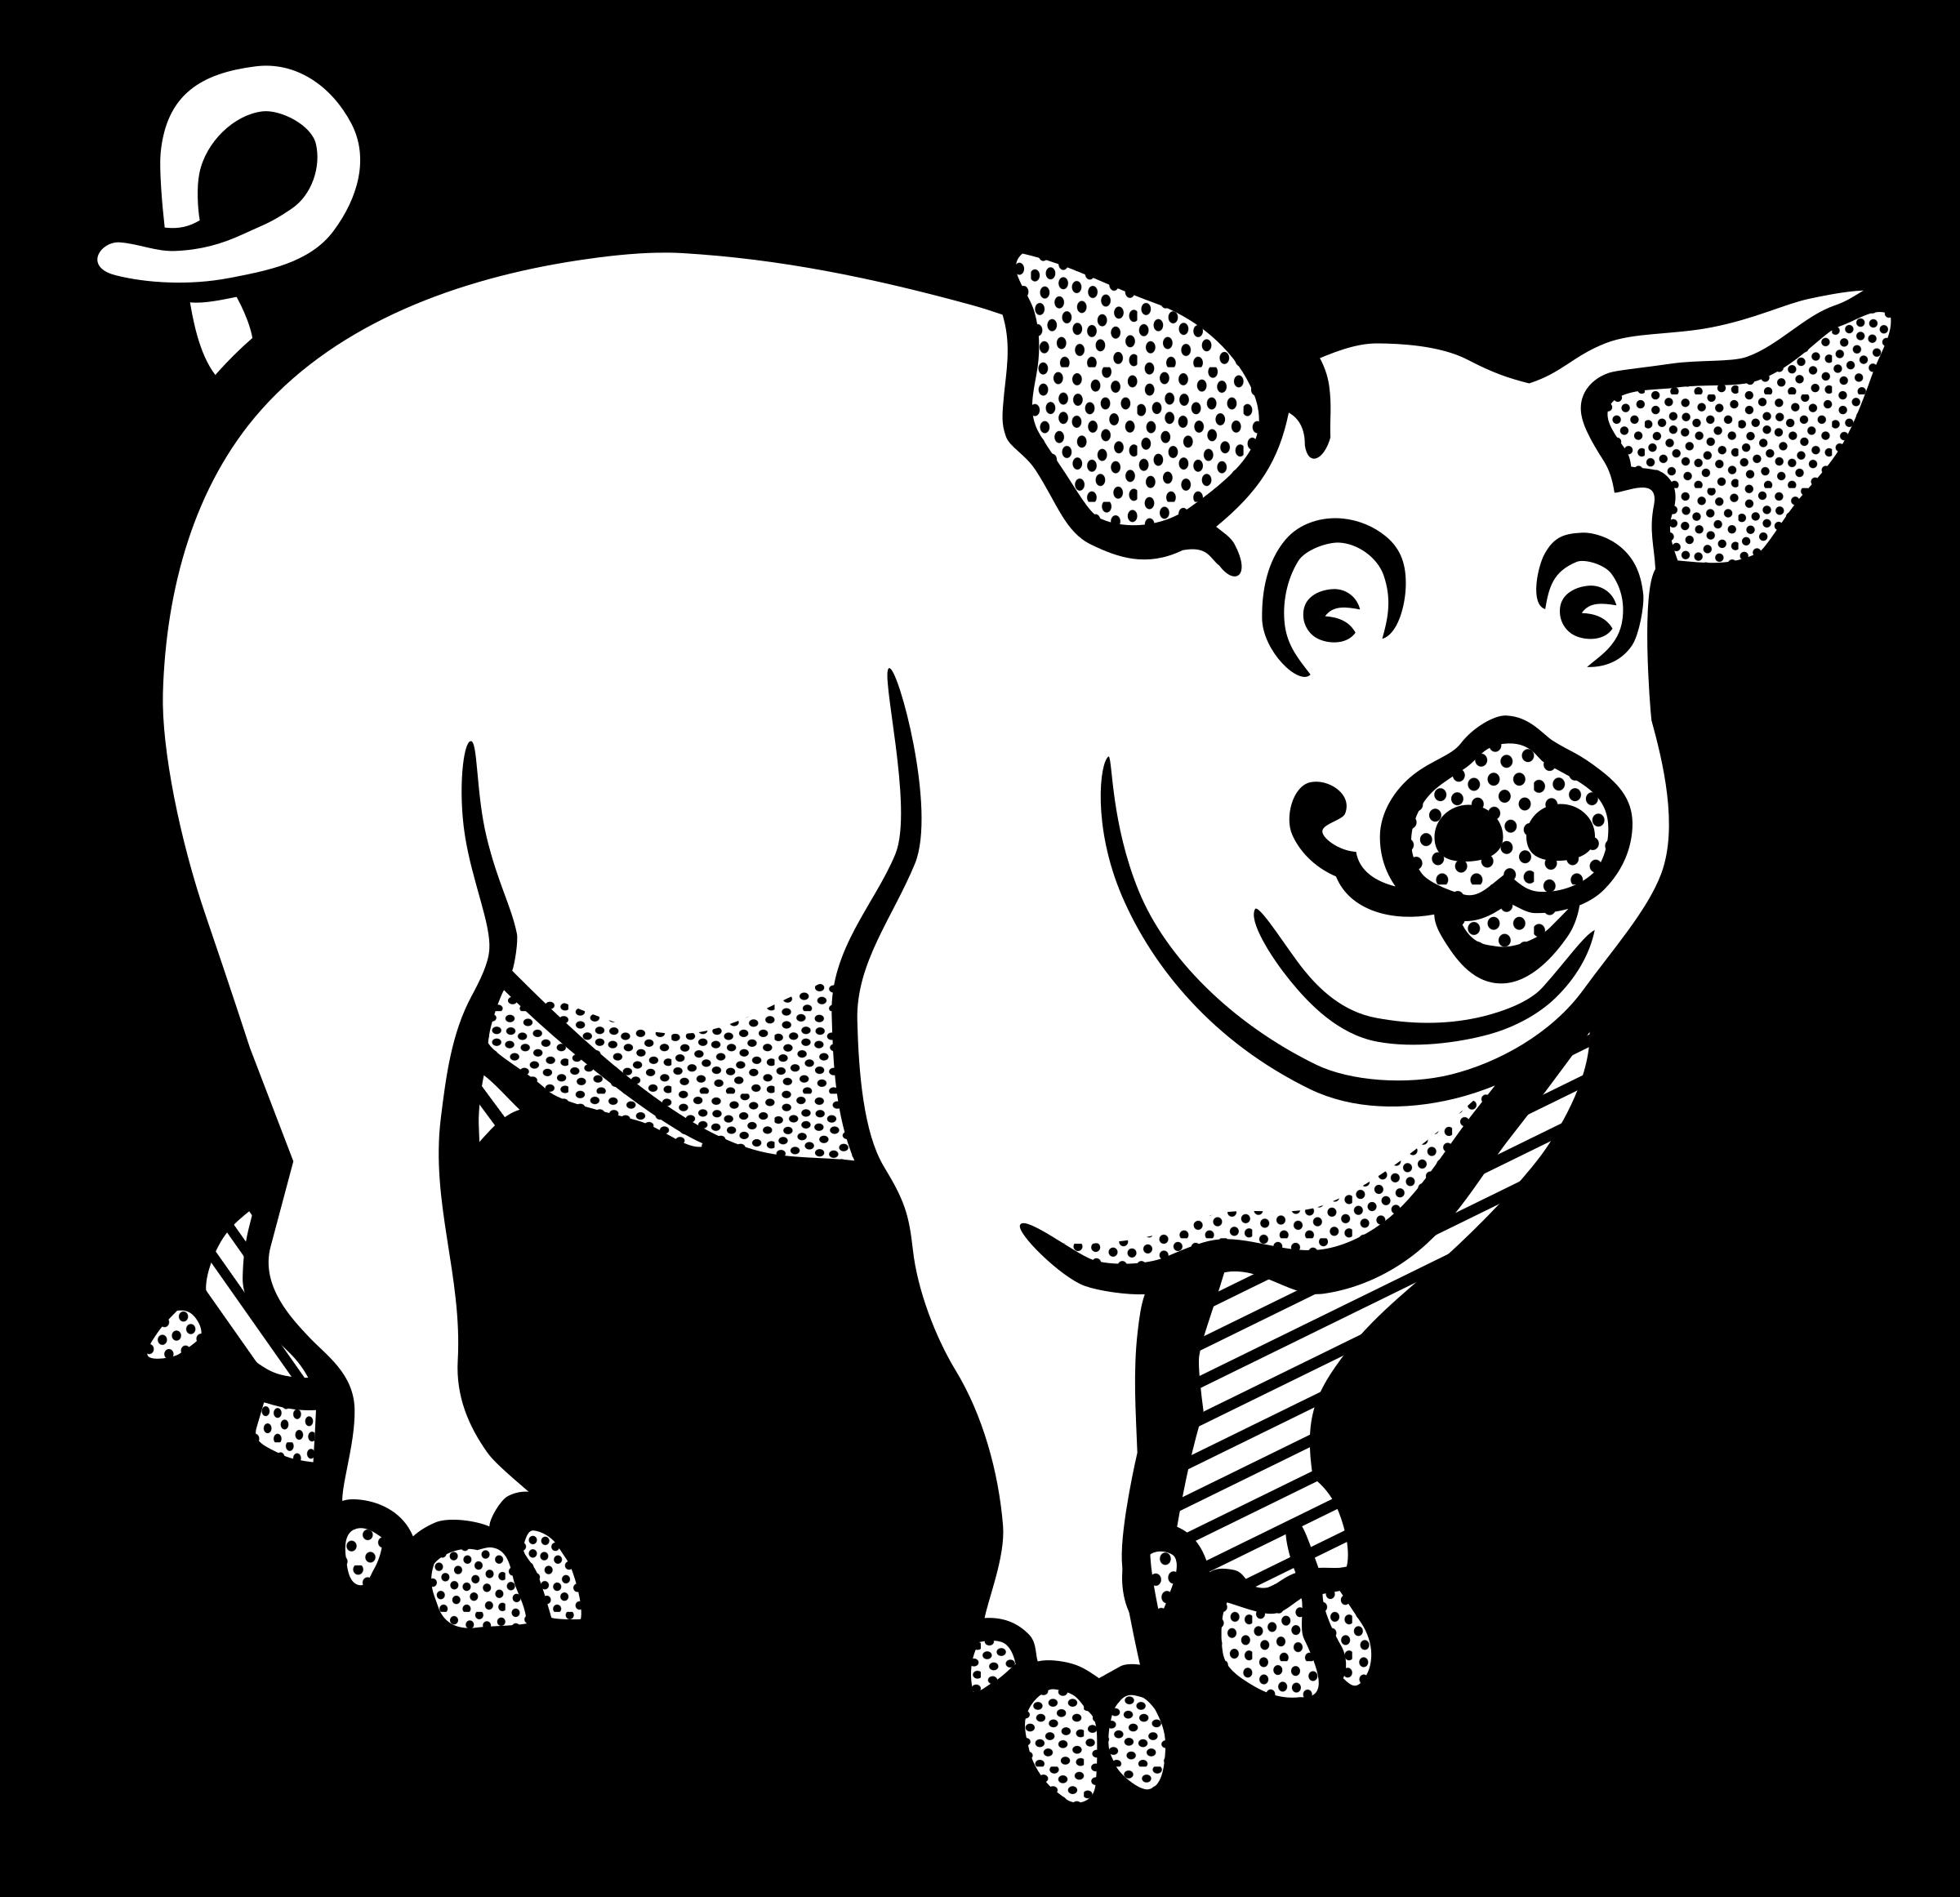 Pigs clipart skeleton. Pig line art image